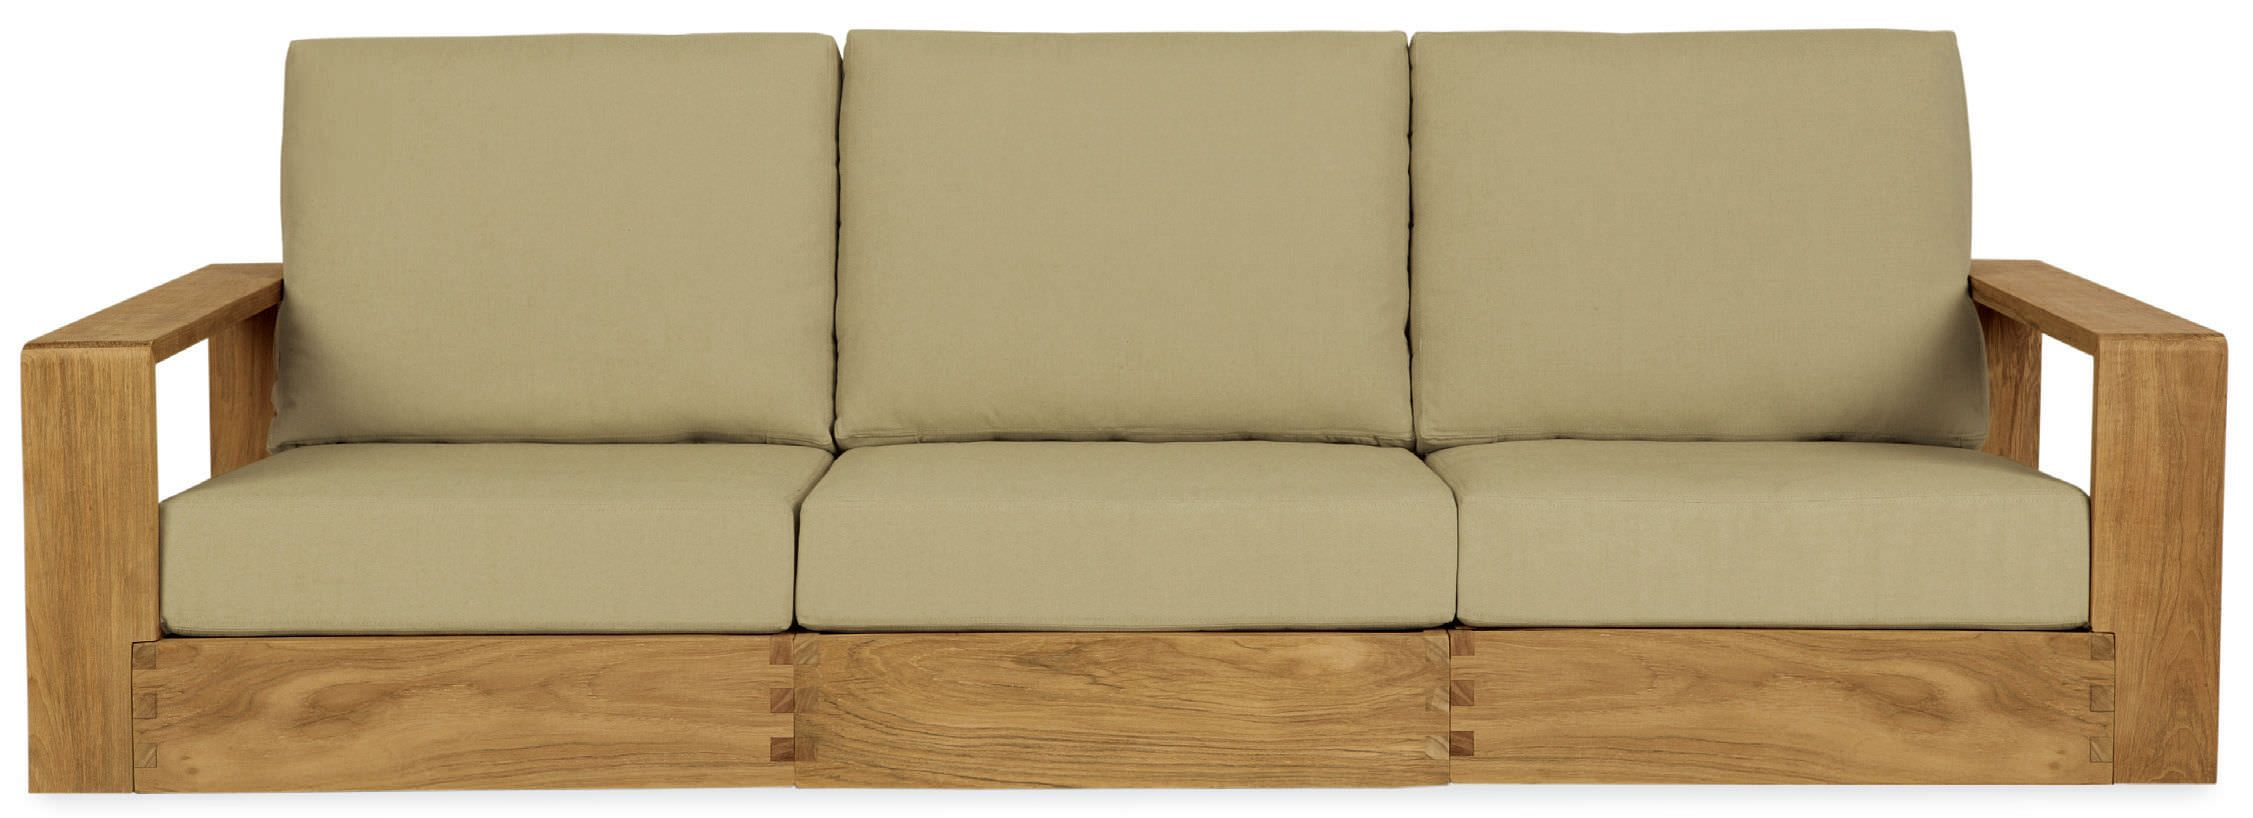 Contemporary sofa / teak / garden / indoor POOLSIDE by John Hutton ...